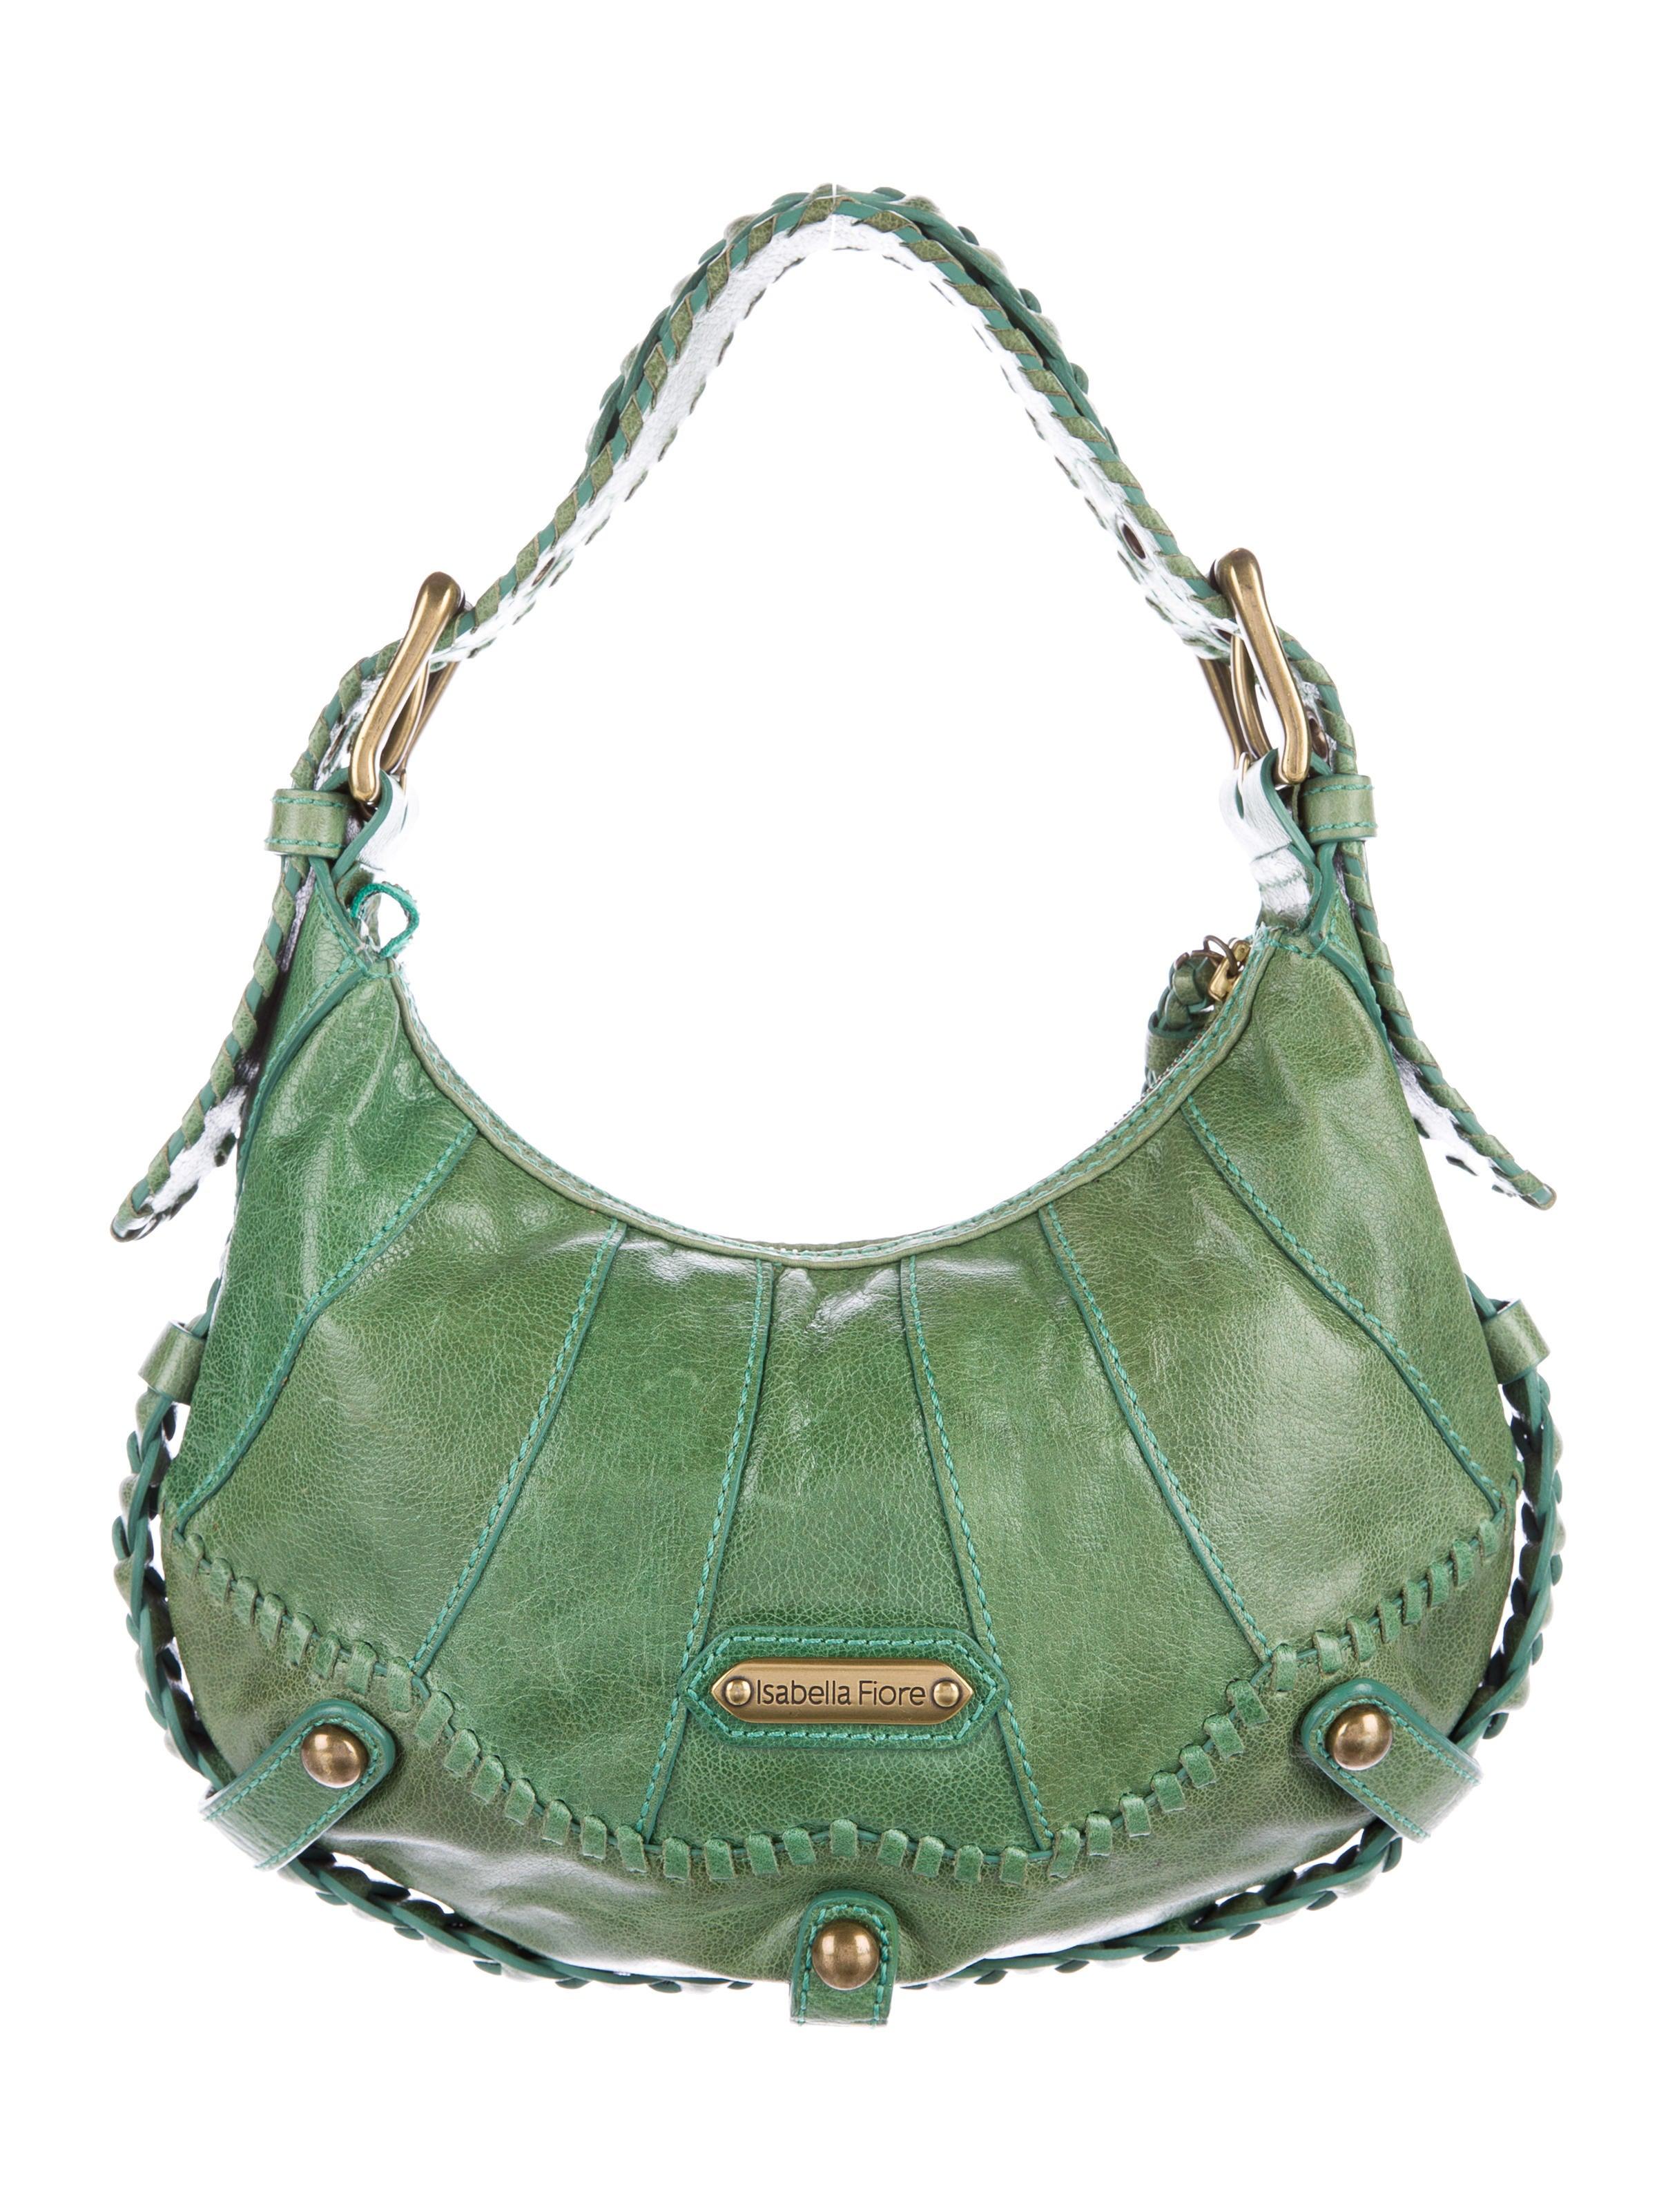 Isabella Fiore Leather Graphic Shoulder Bag Handbags